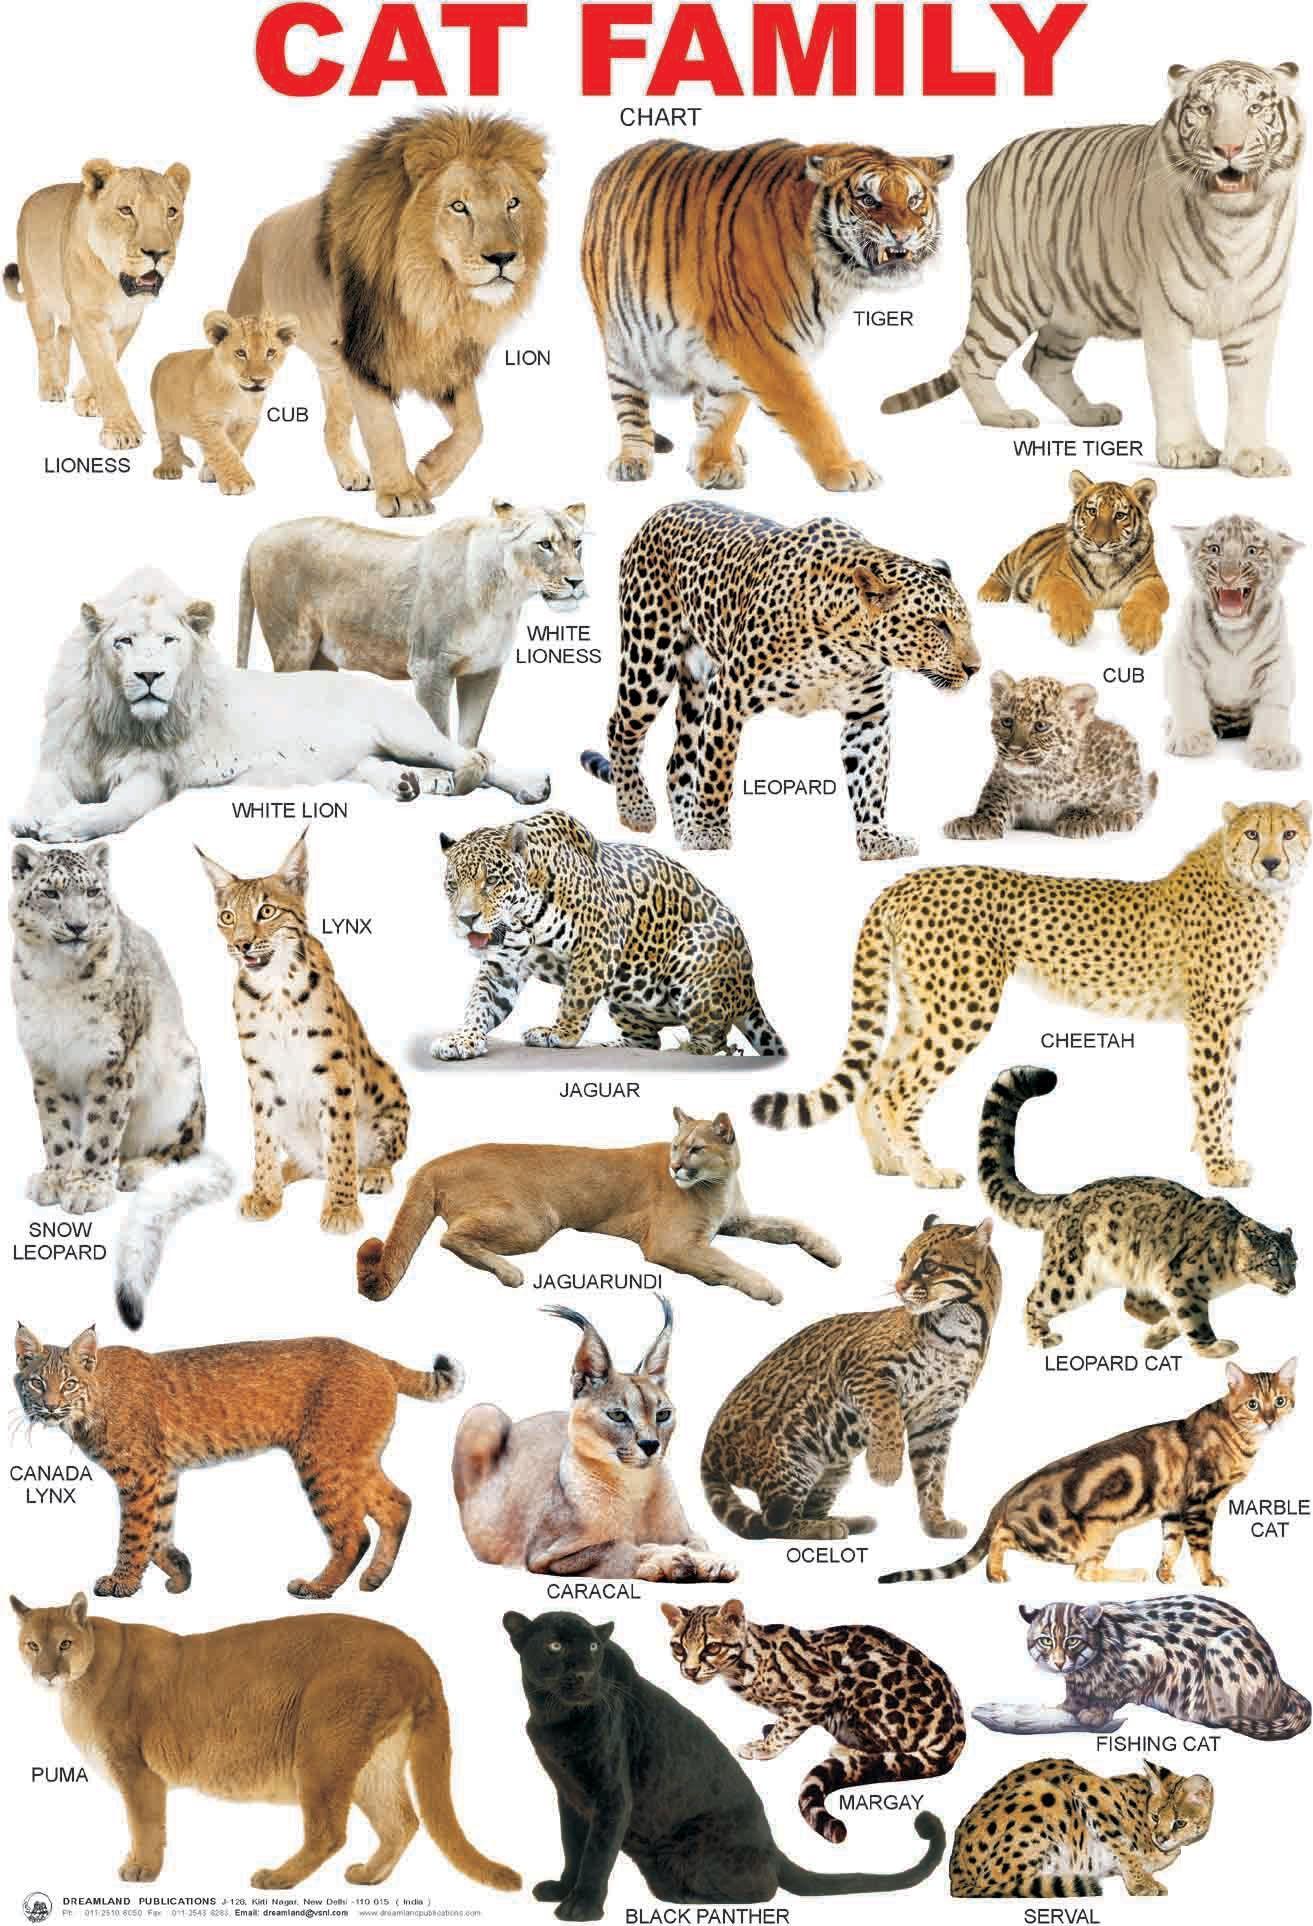 cat breed chart Google Search BigCatFamily Cat breeds